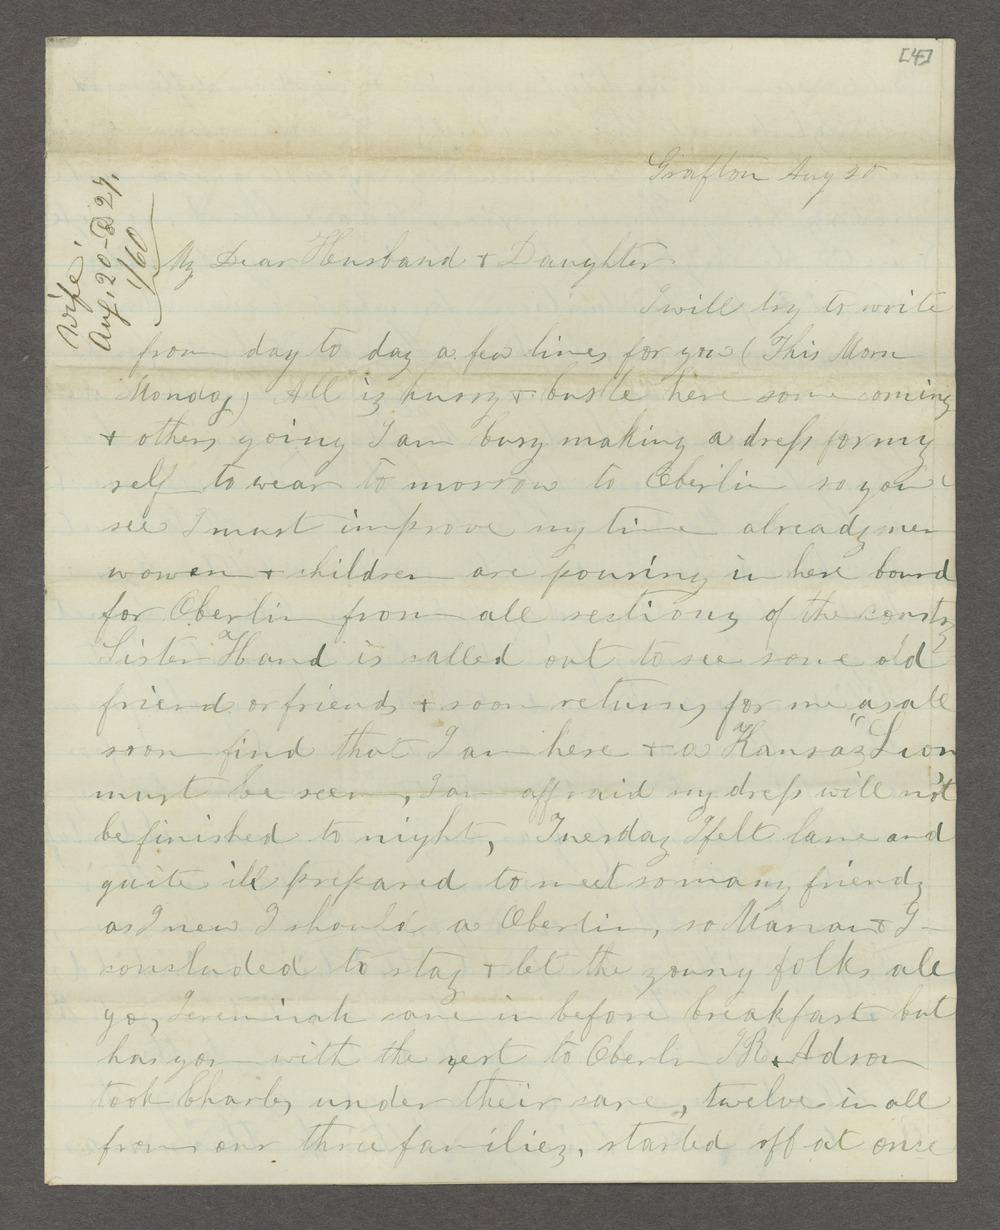 Correspondence between Samuel Lyle Adair, Florella Brown Adair, and their children - 5